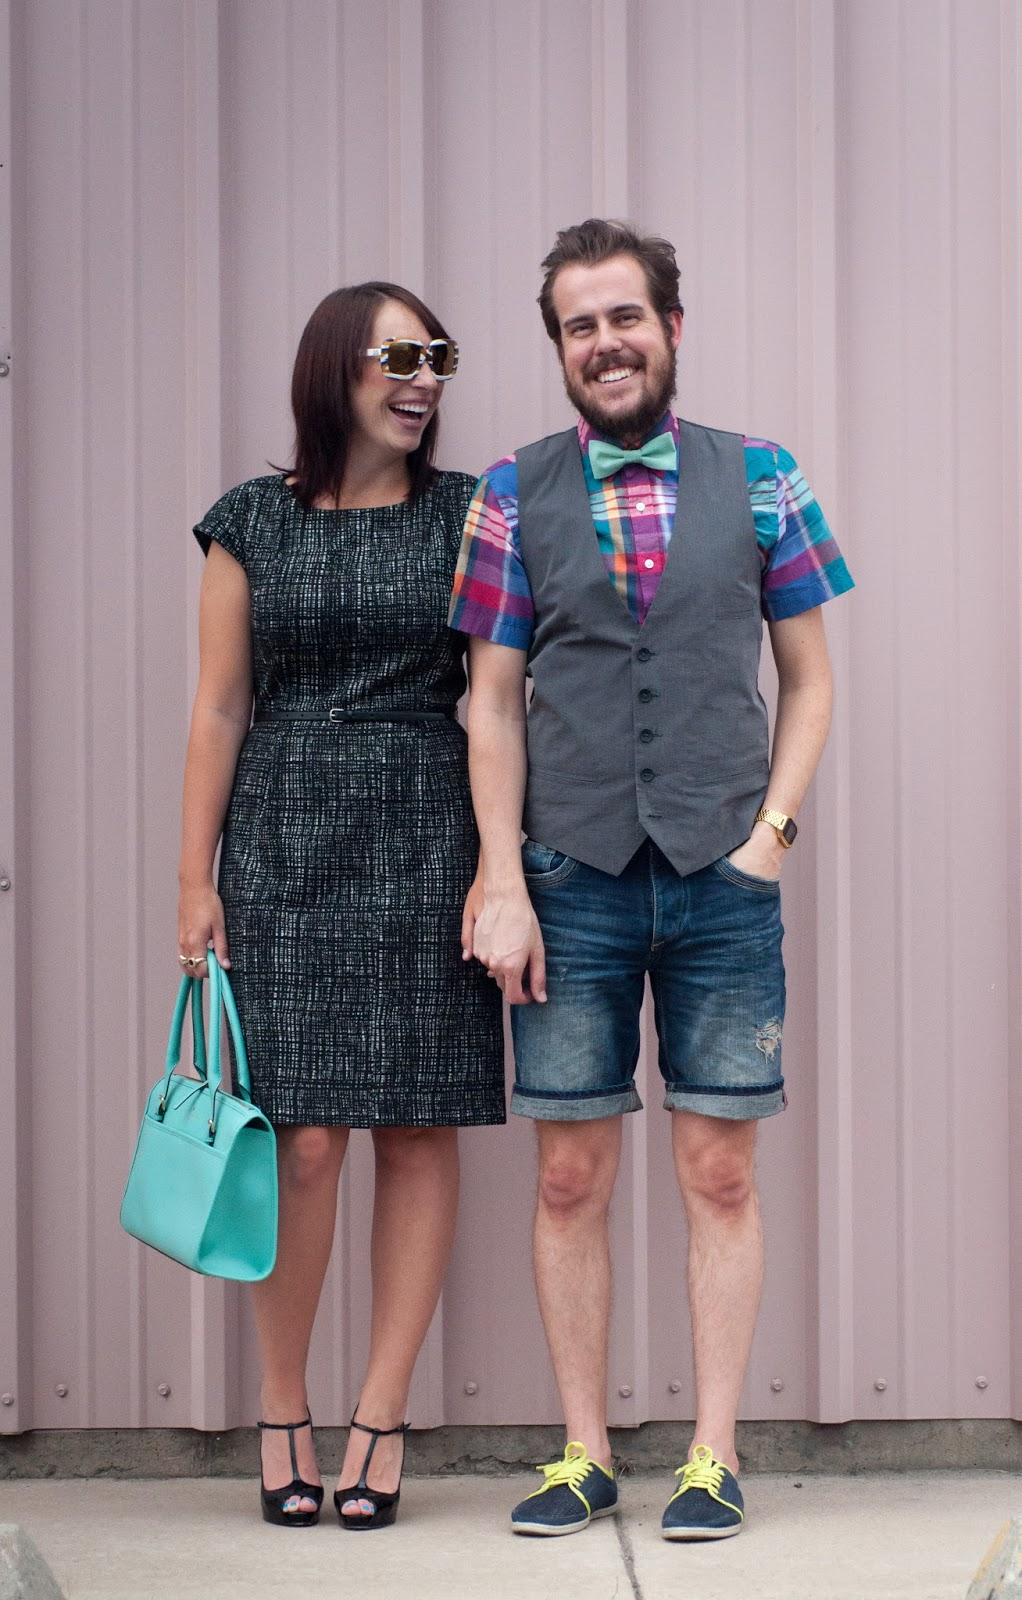 couples fashion, couples style, wedding attire, ootd, zara men, kate spade handbag, target style